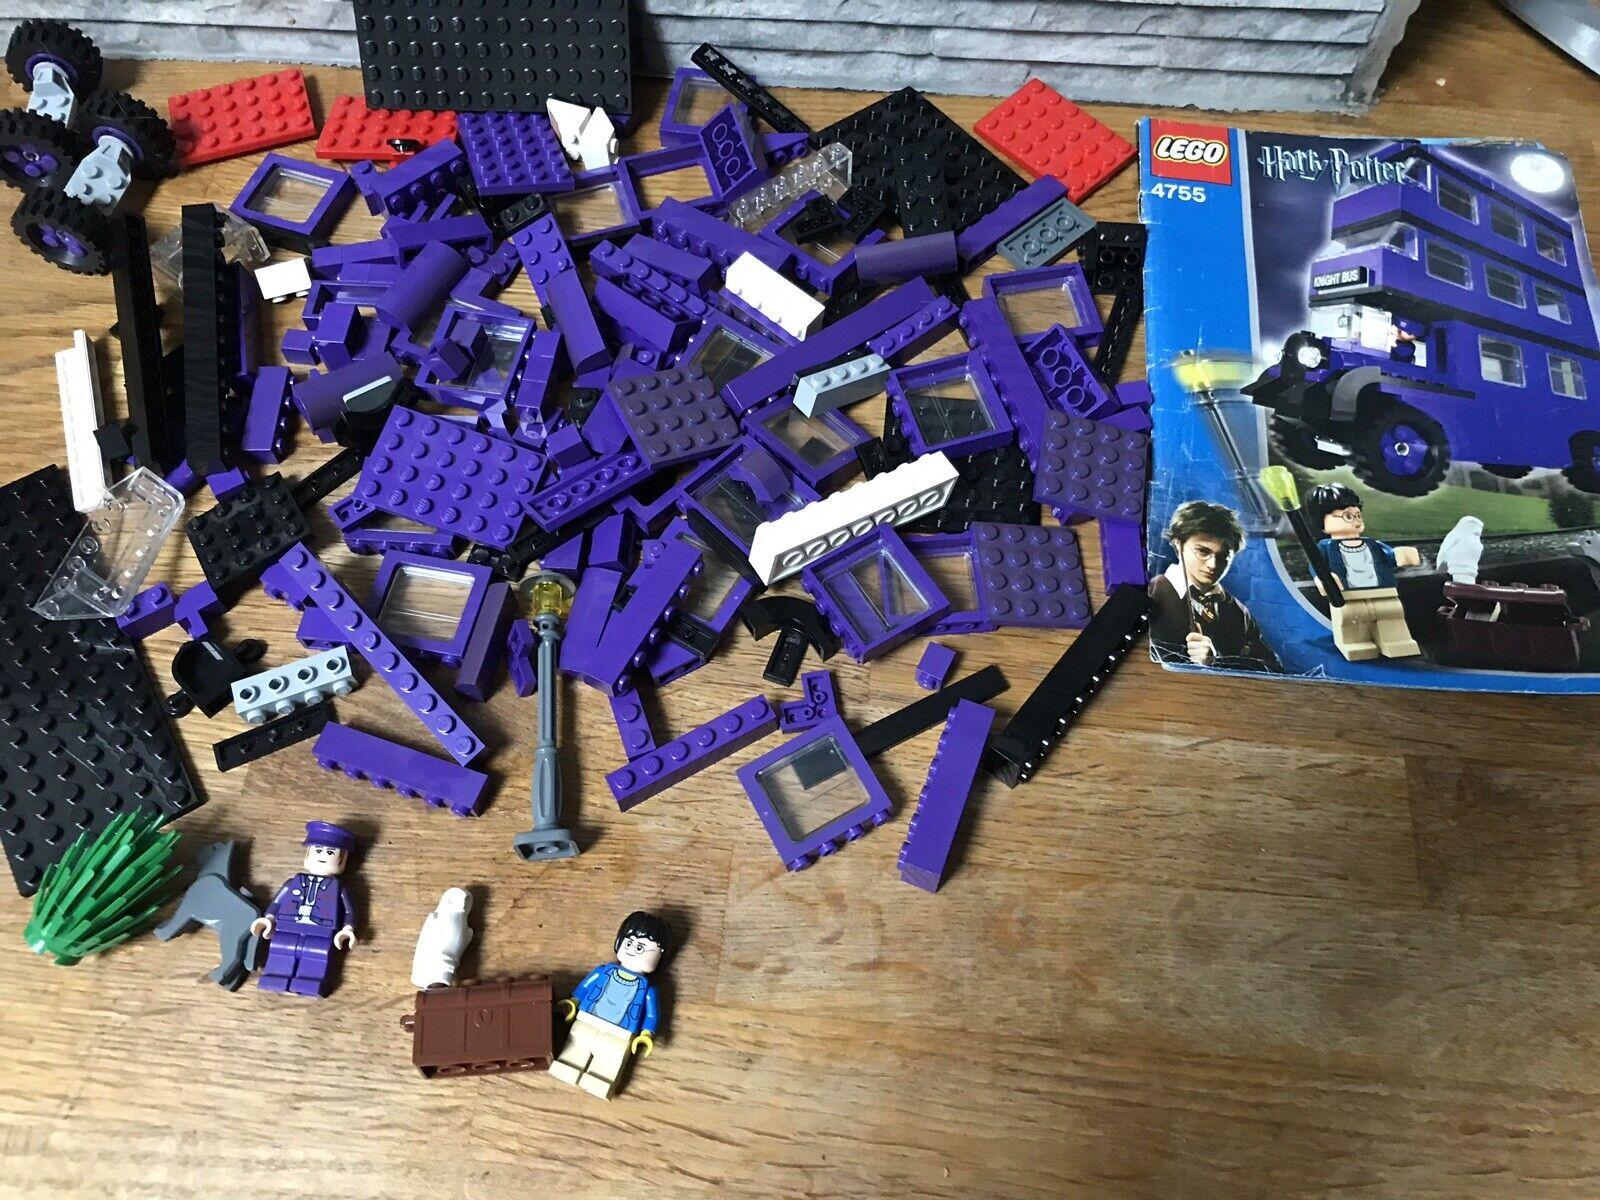 Lego Harry Potter Knight Bus set 4755